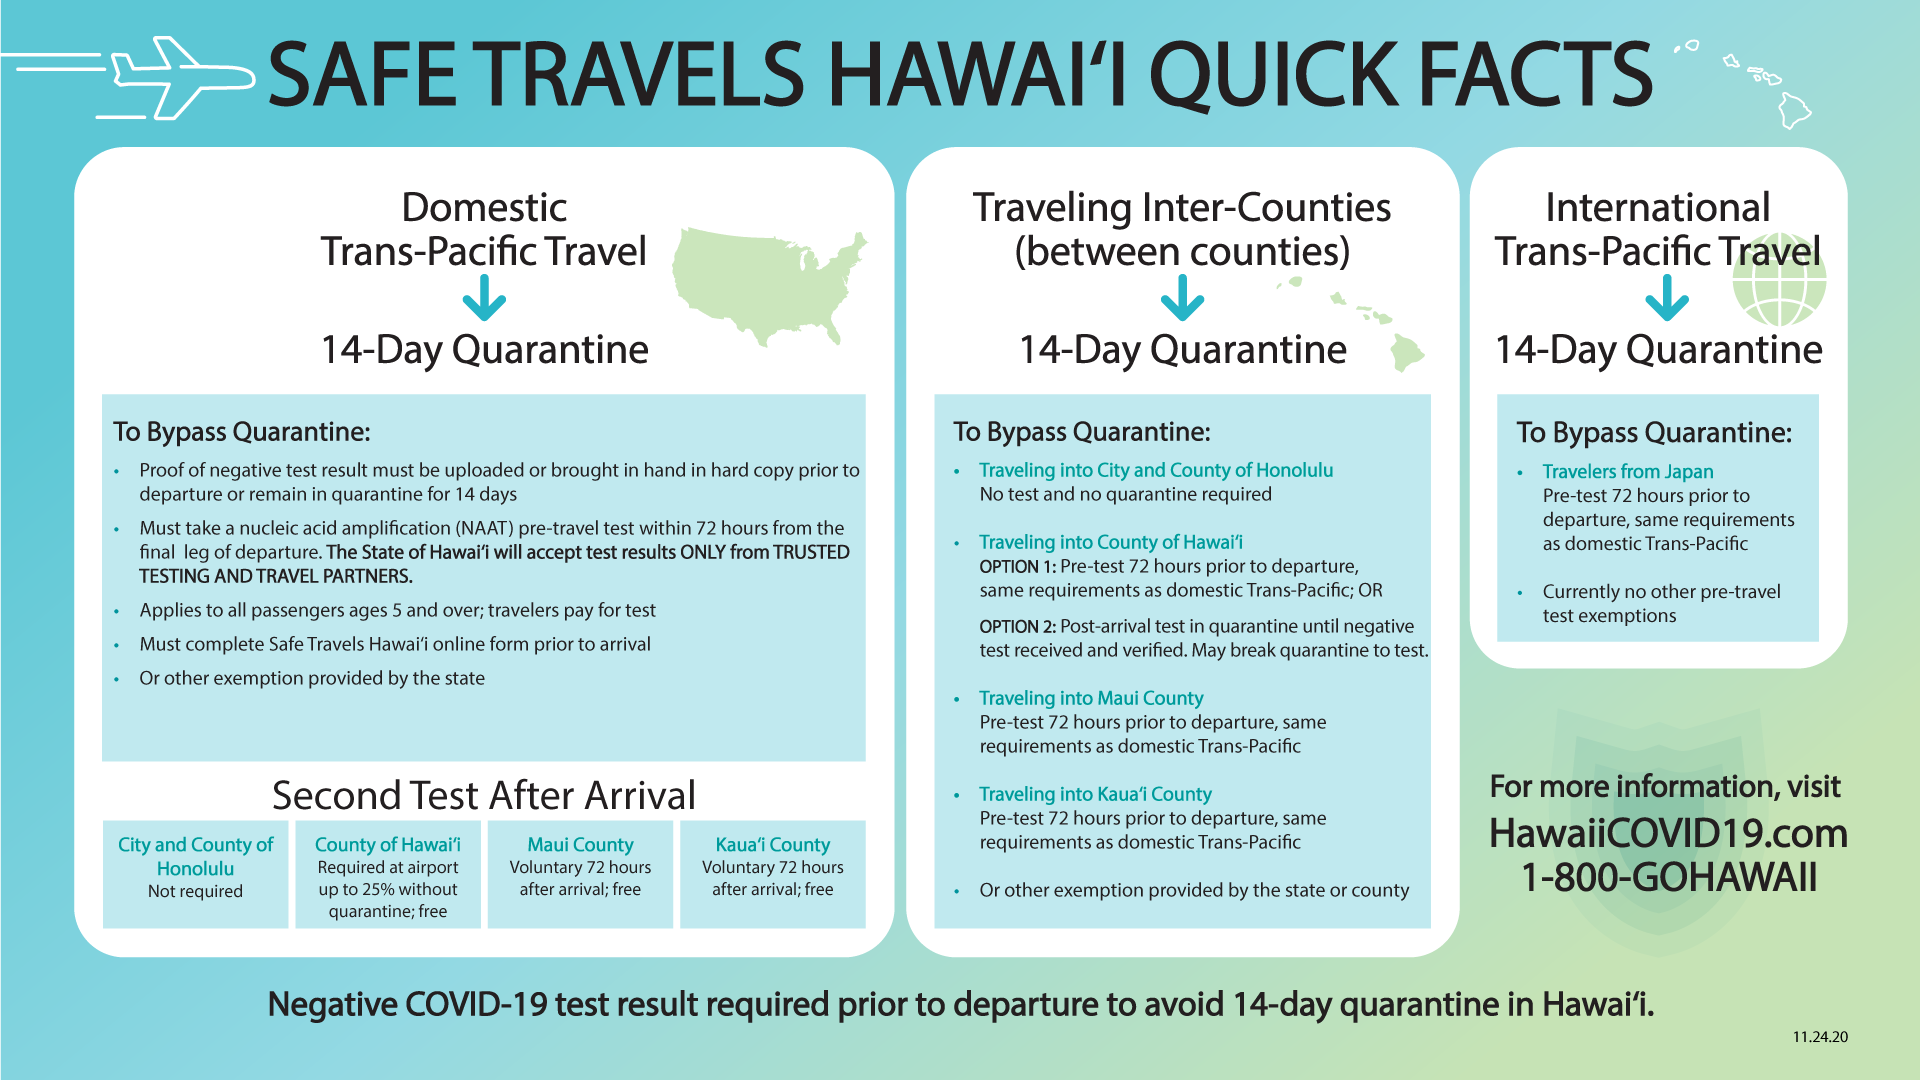 Safe Travels Hawaii Quick Facts - November 24 2020